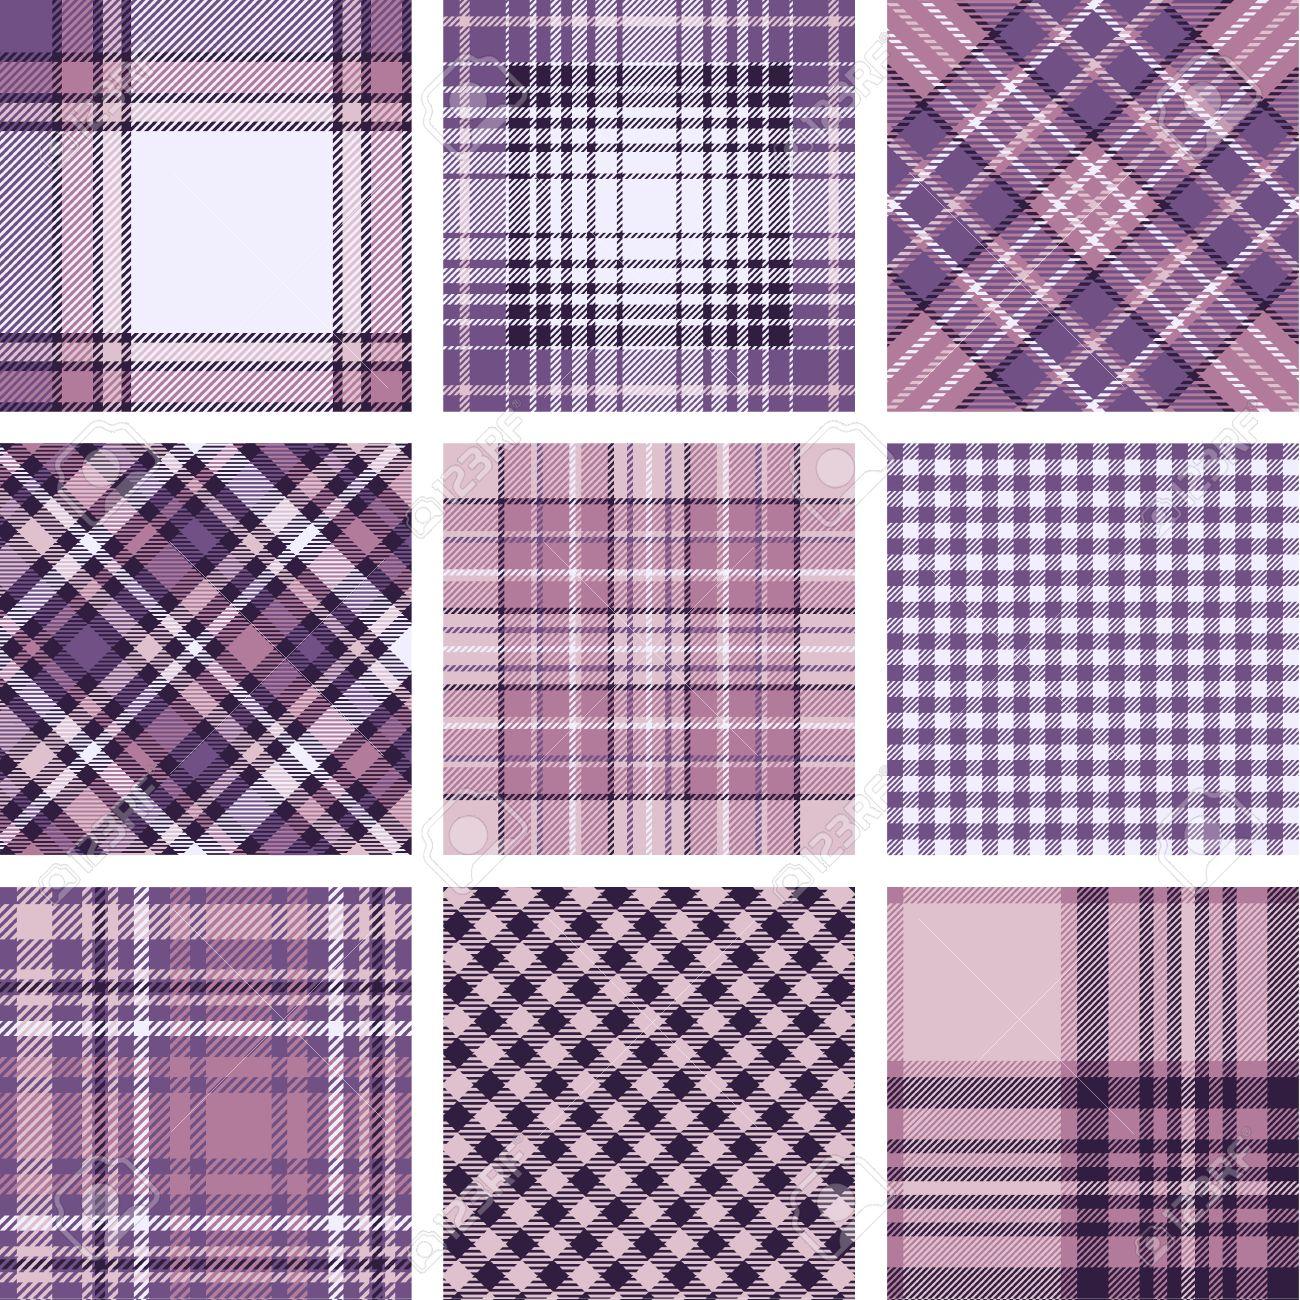 Plaid patterns - 15374830